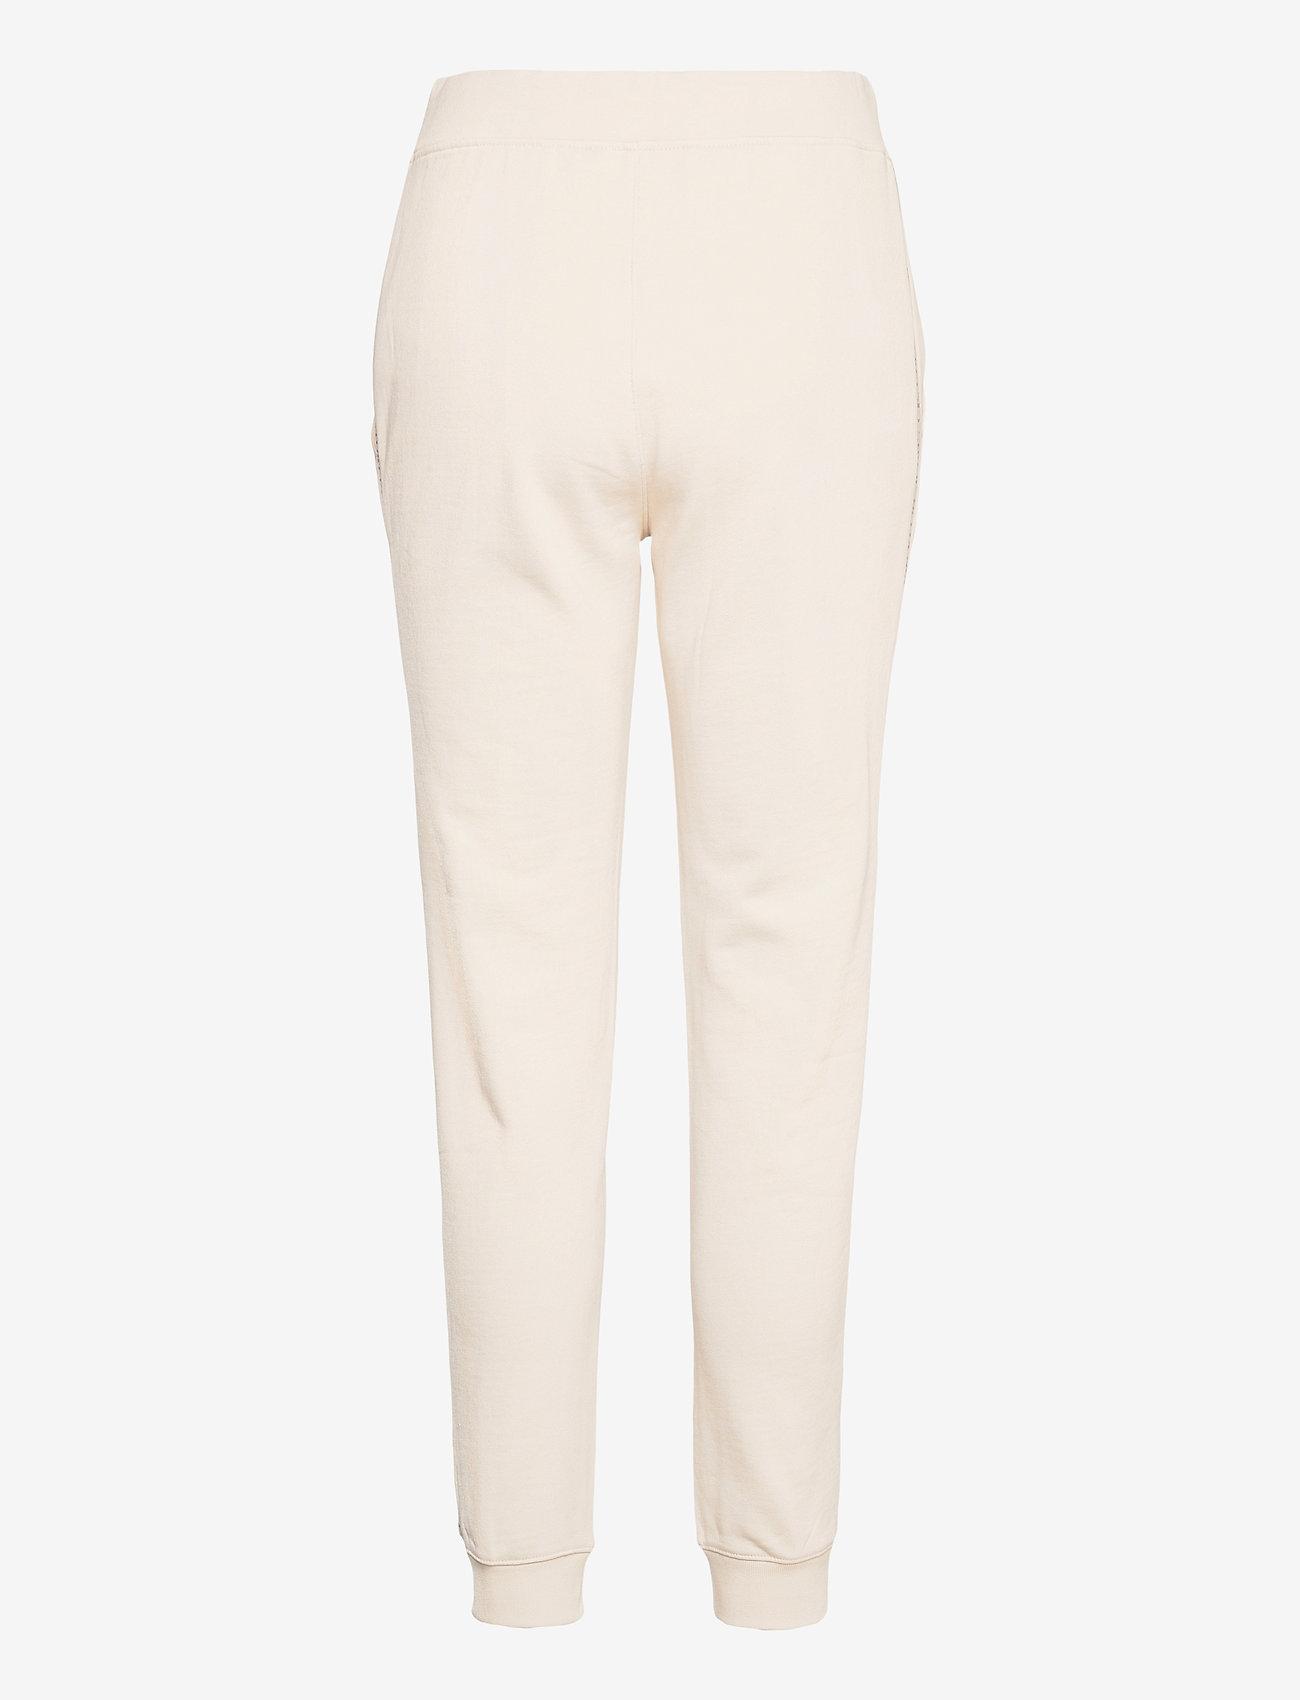 Calvin Klein Jeans - LOGO TRIM JOGGING PANT - klær - white sand - 1